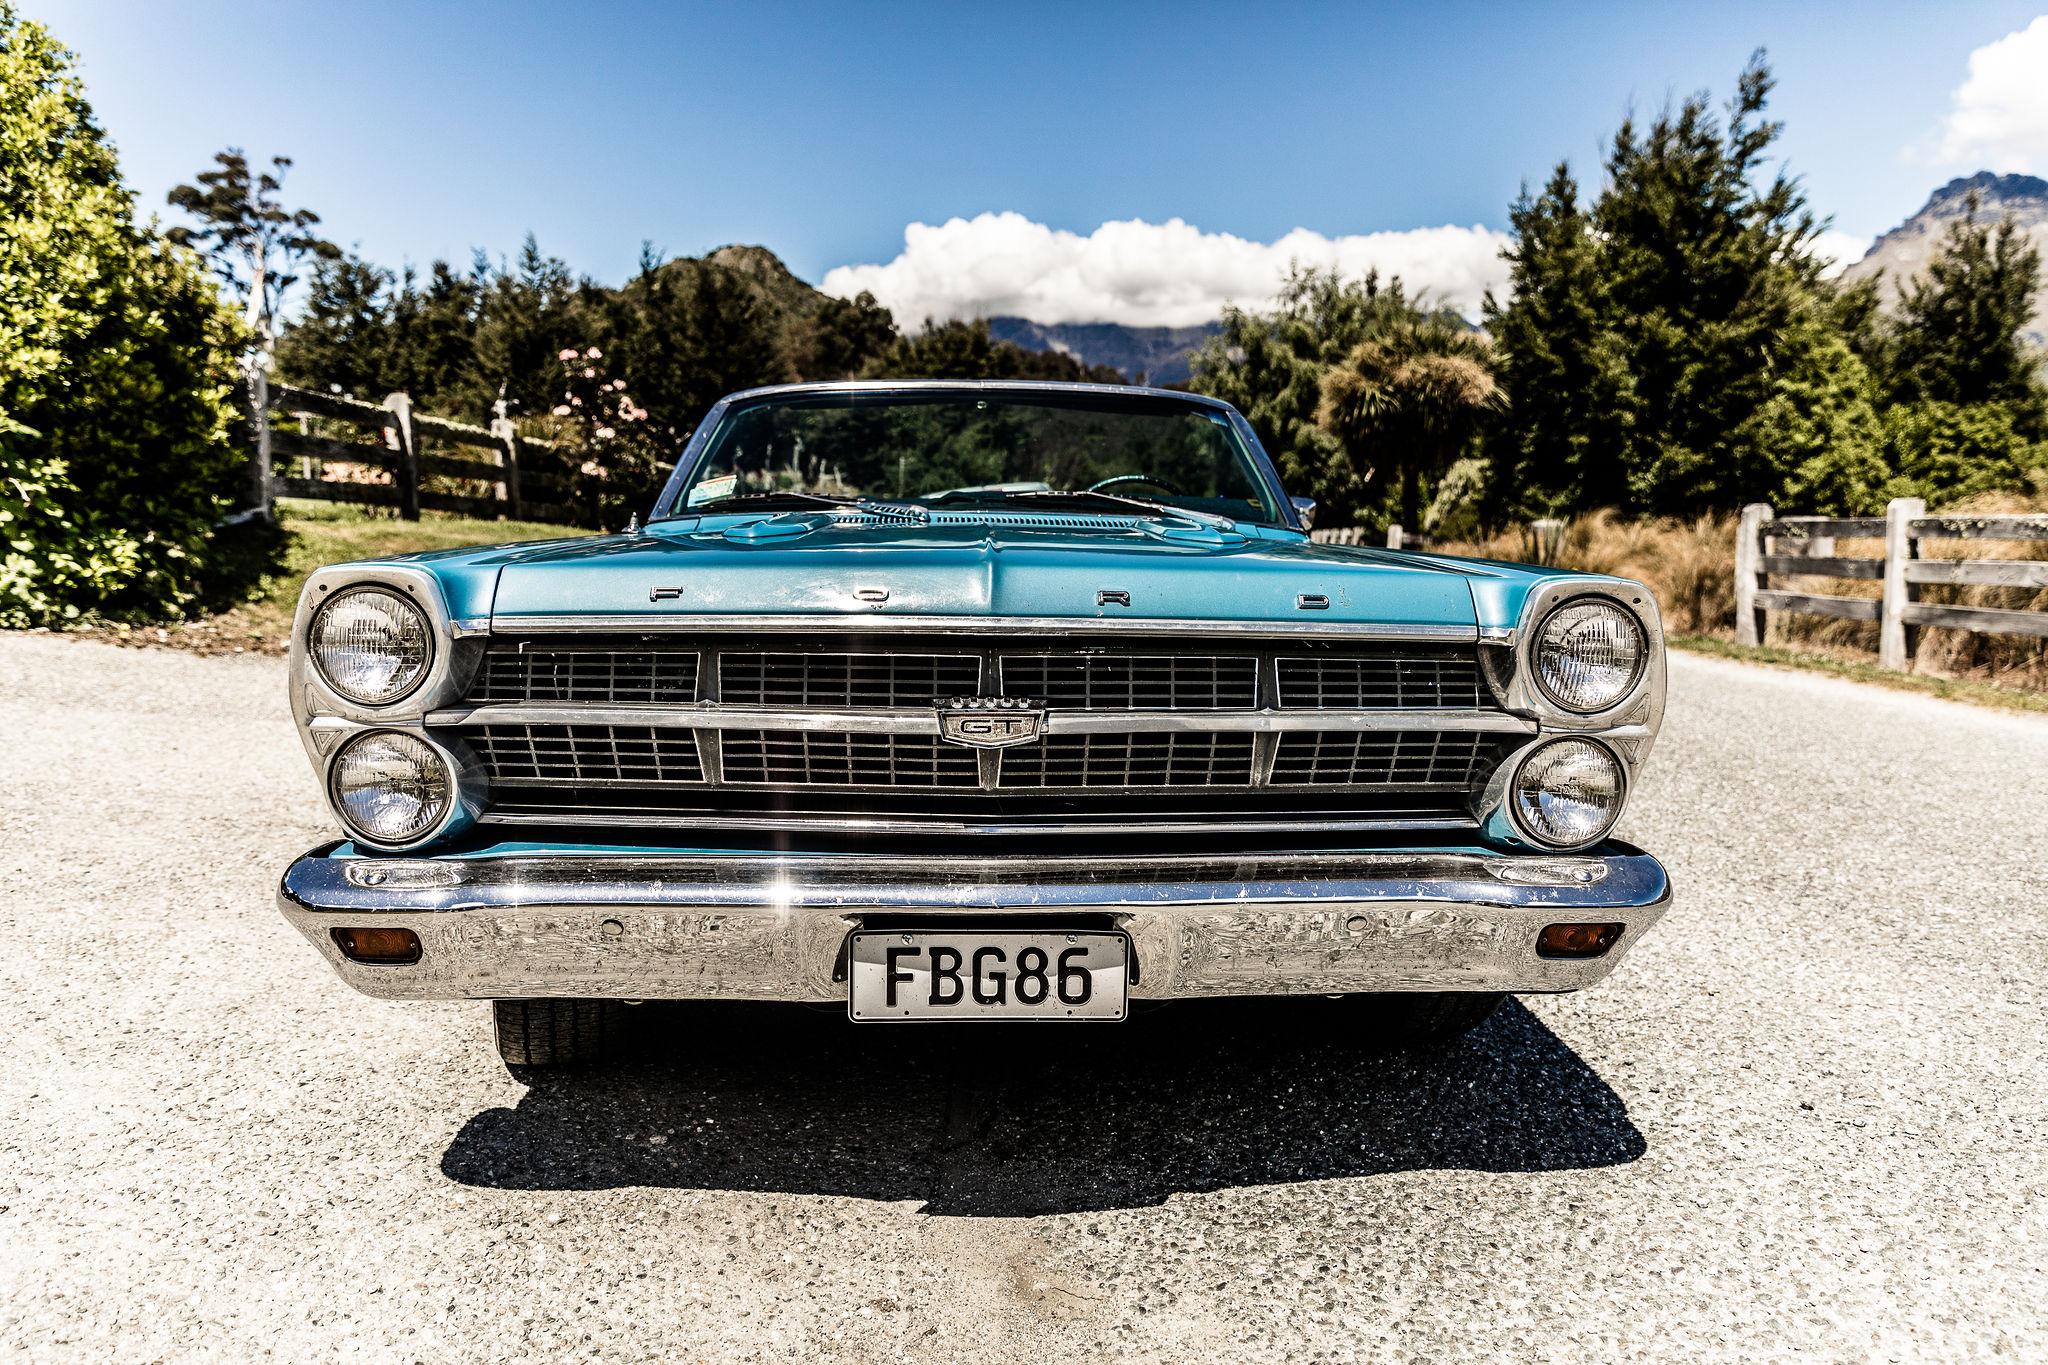 46 Tui Drive - Susan Miller Photography